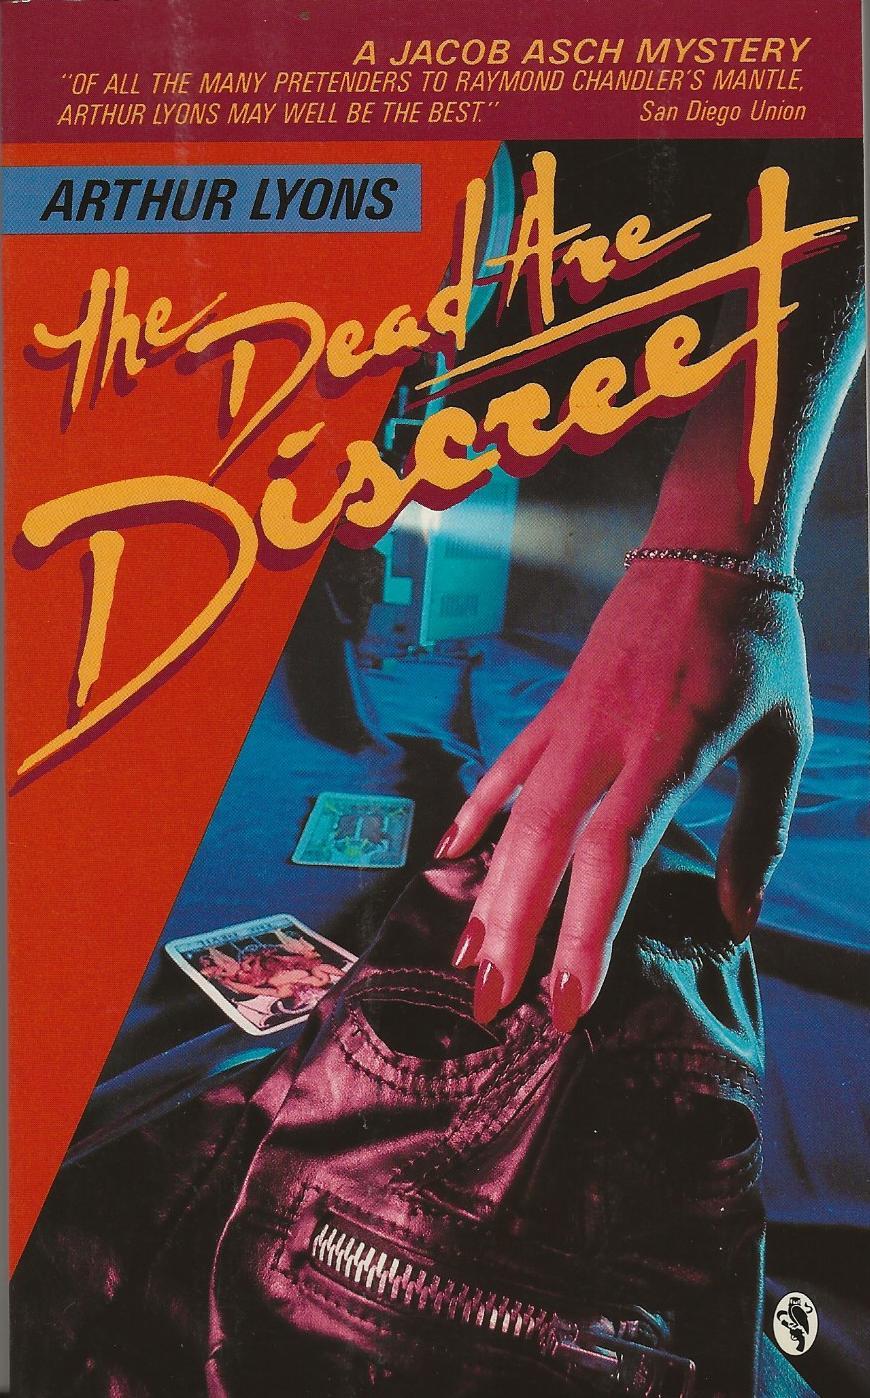 THE DEAD ARE DISCREET